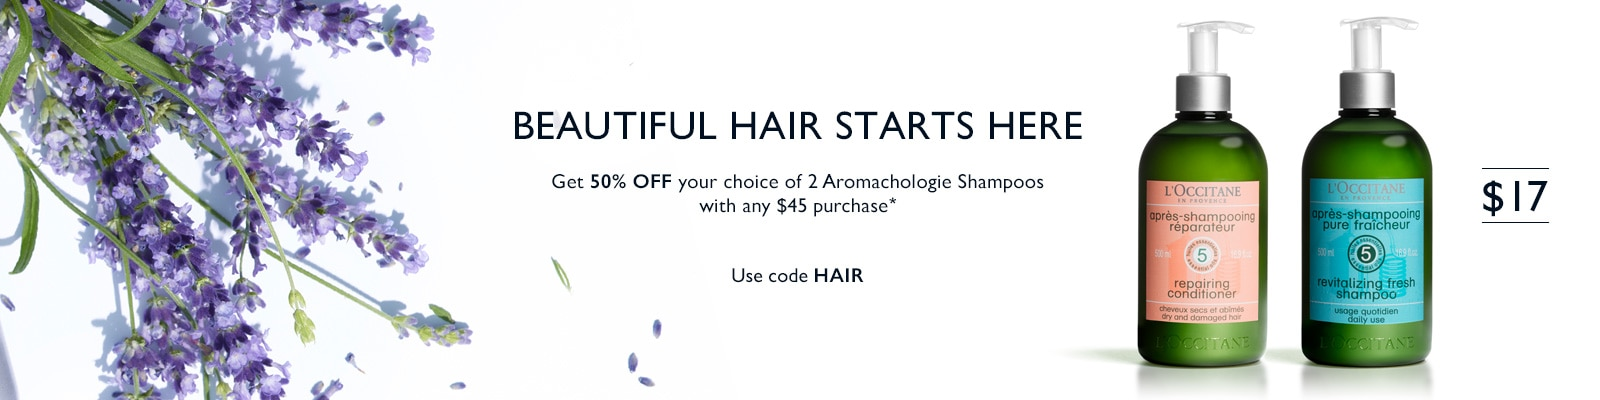 Use code HAIR